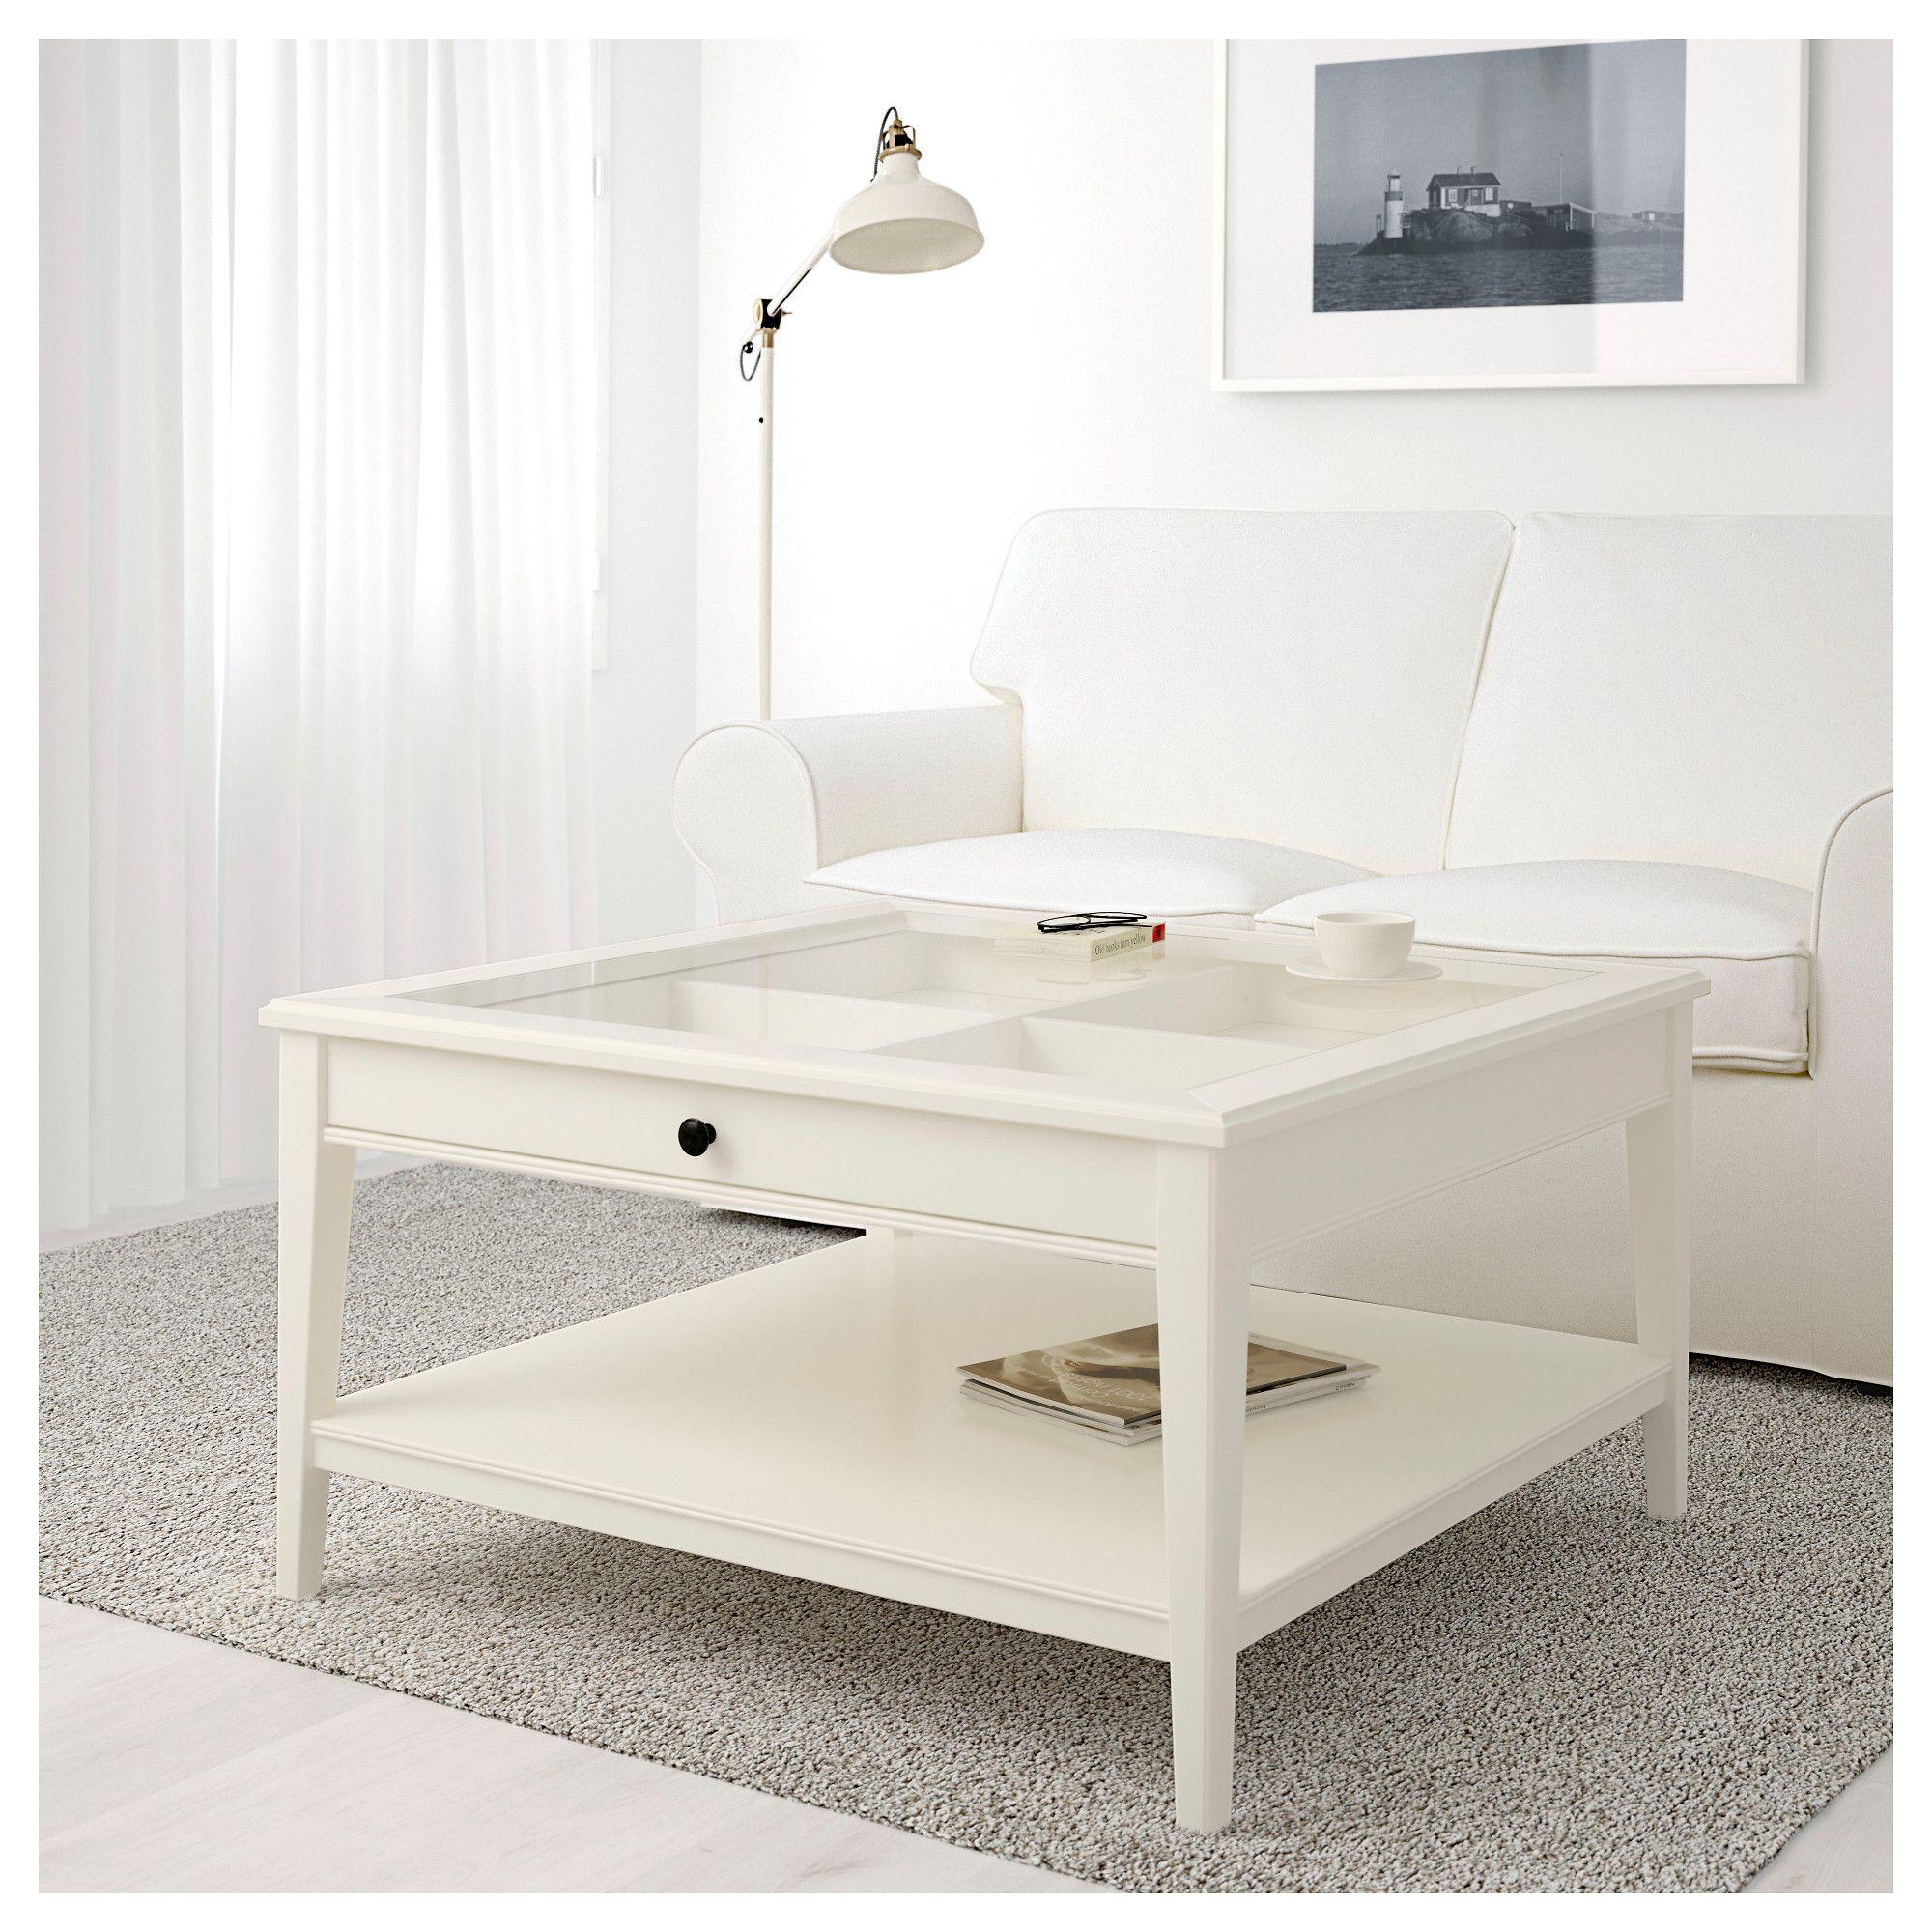 LIATORP Coffee table White/glass IKEA Ikea white coffee